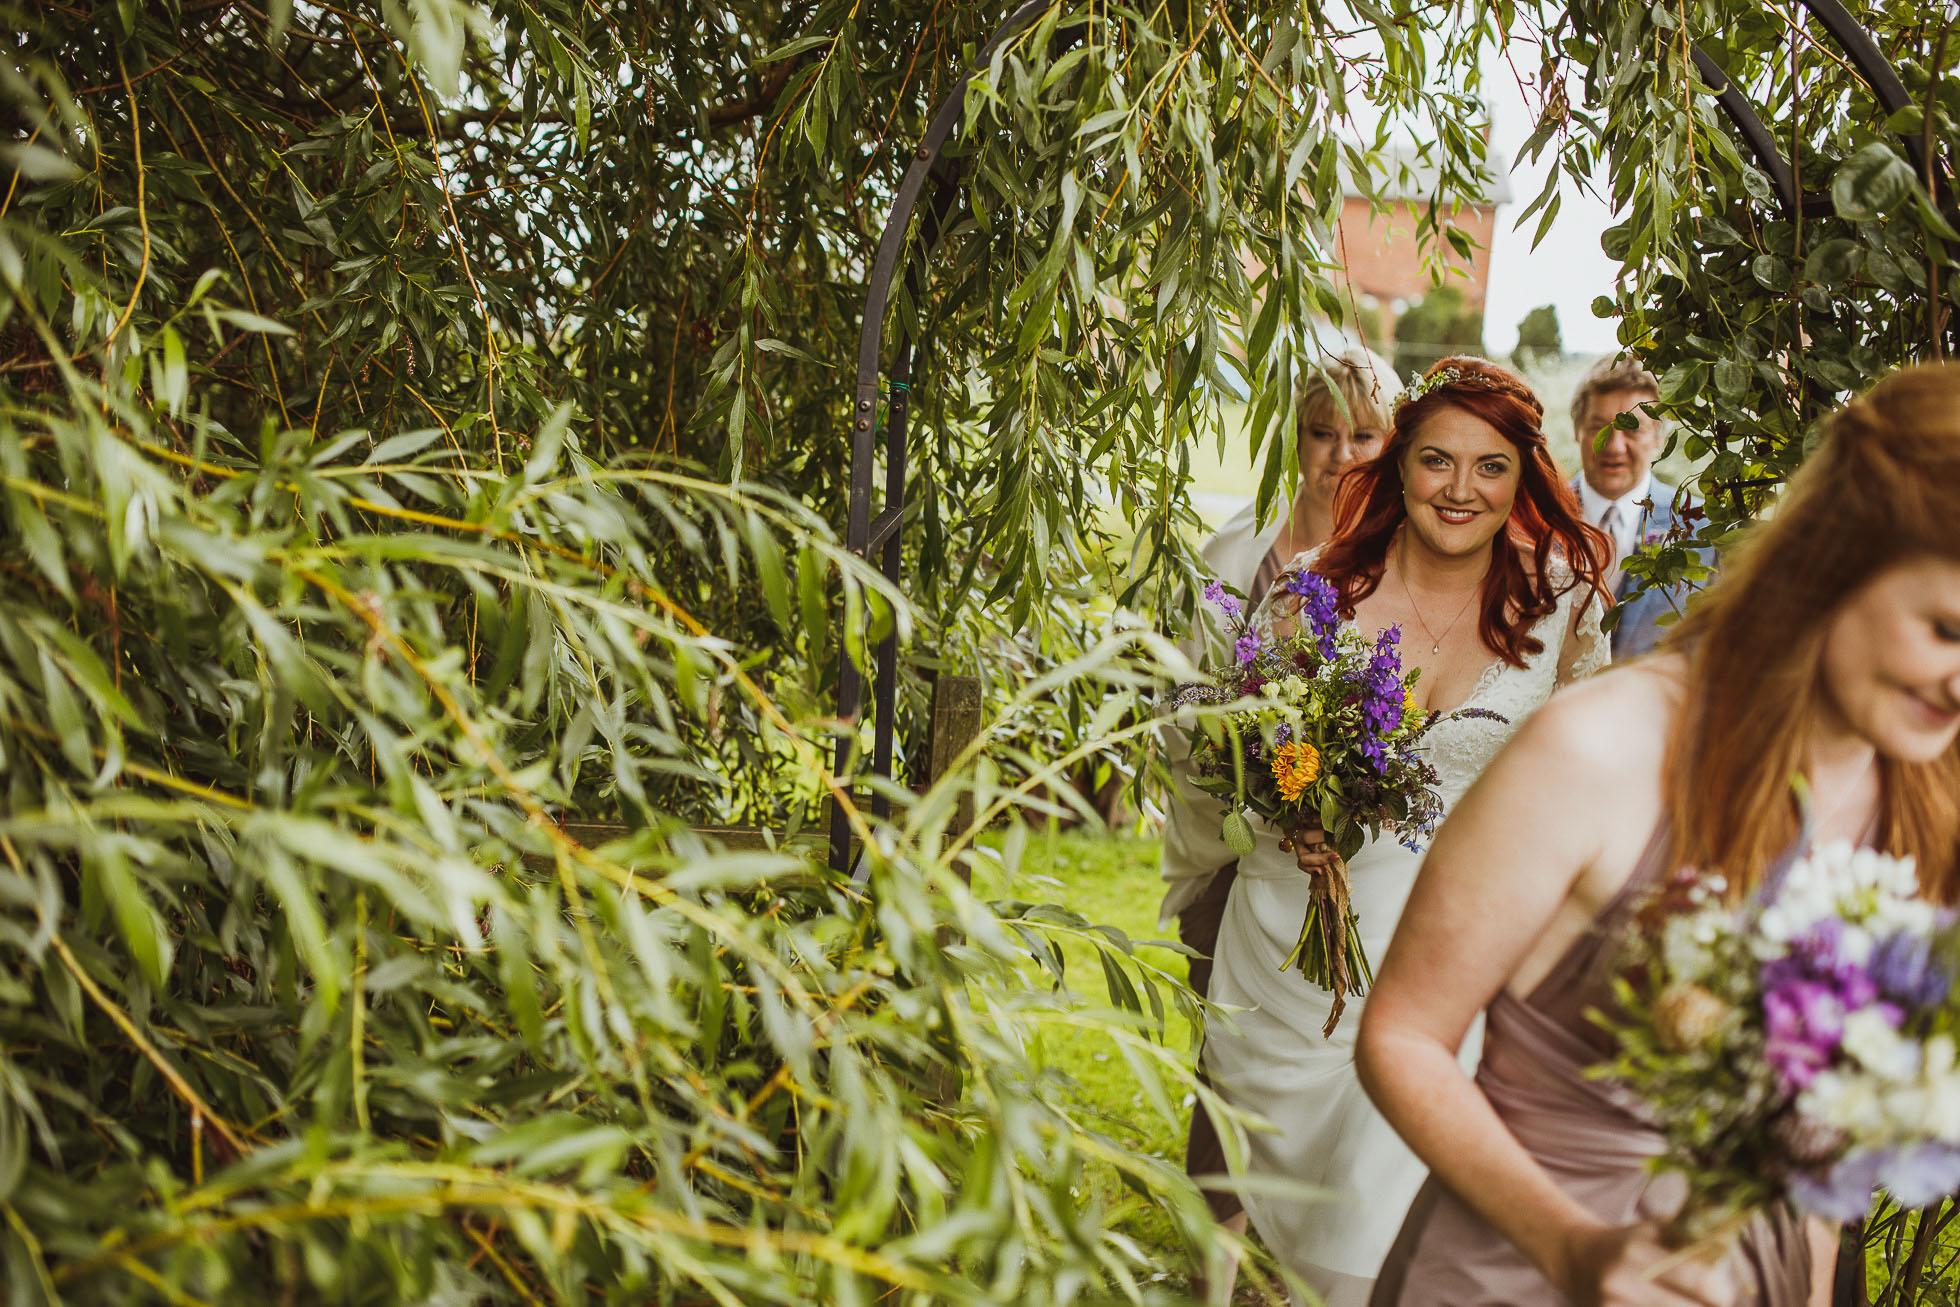 skipbridge_farm_wedding_york-38.jpg